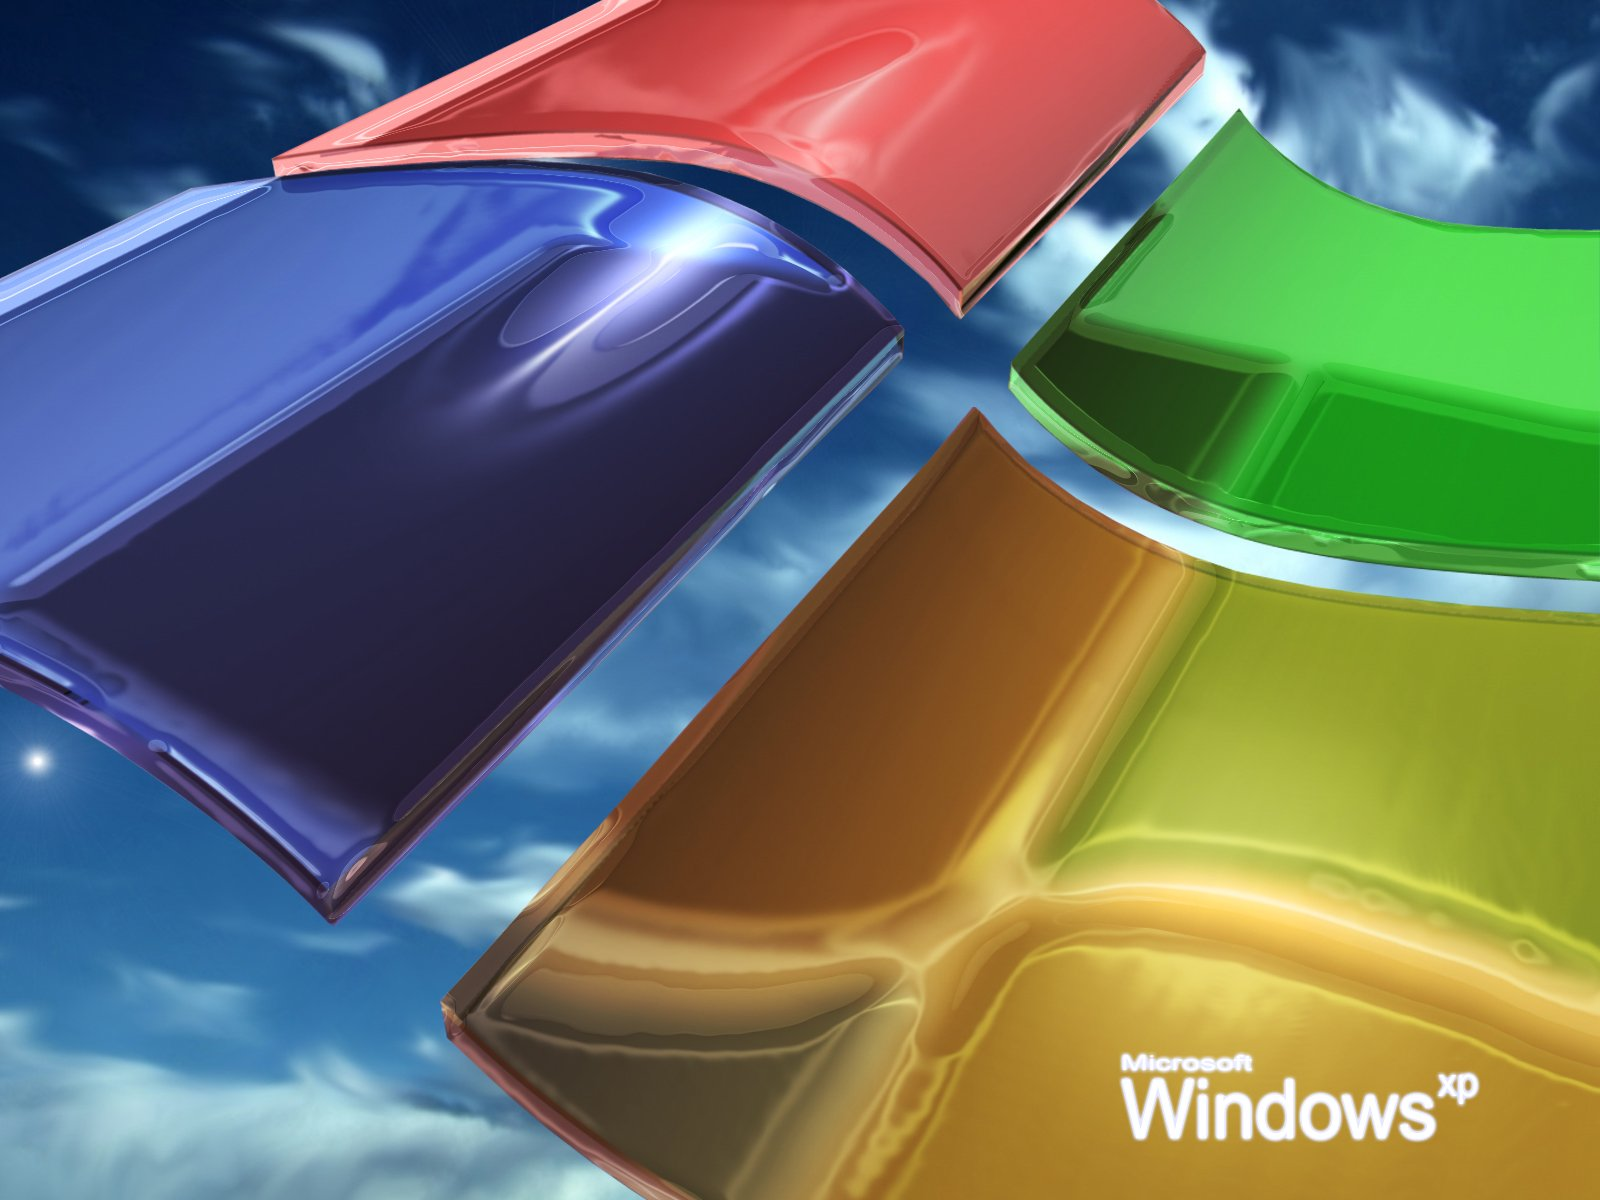 Wallpaper jolie Theme Windows XP